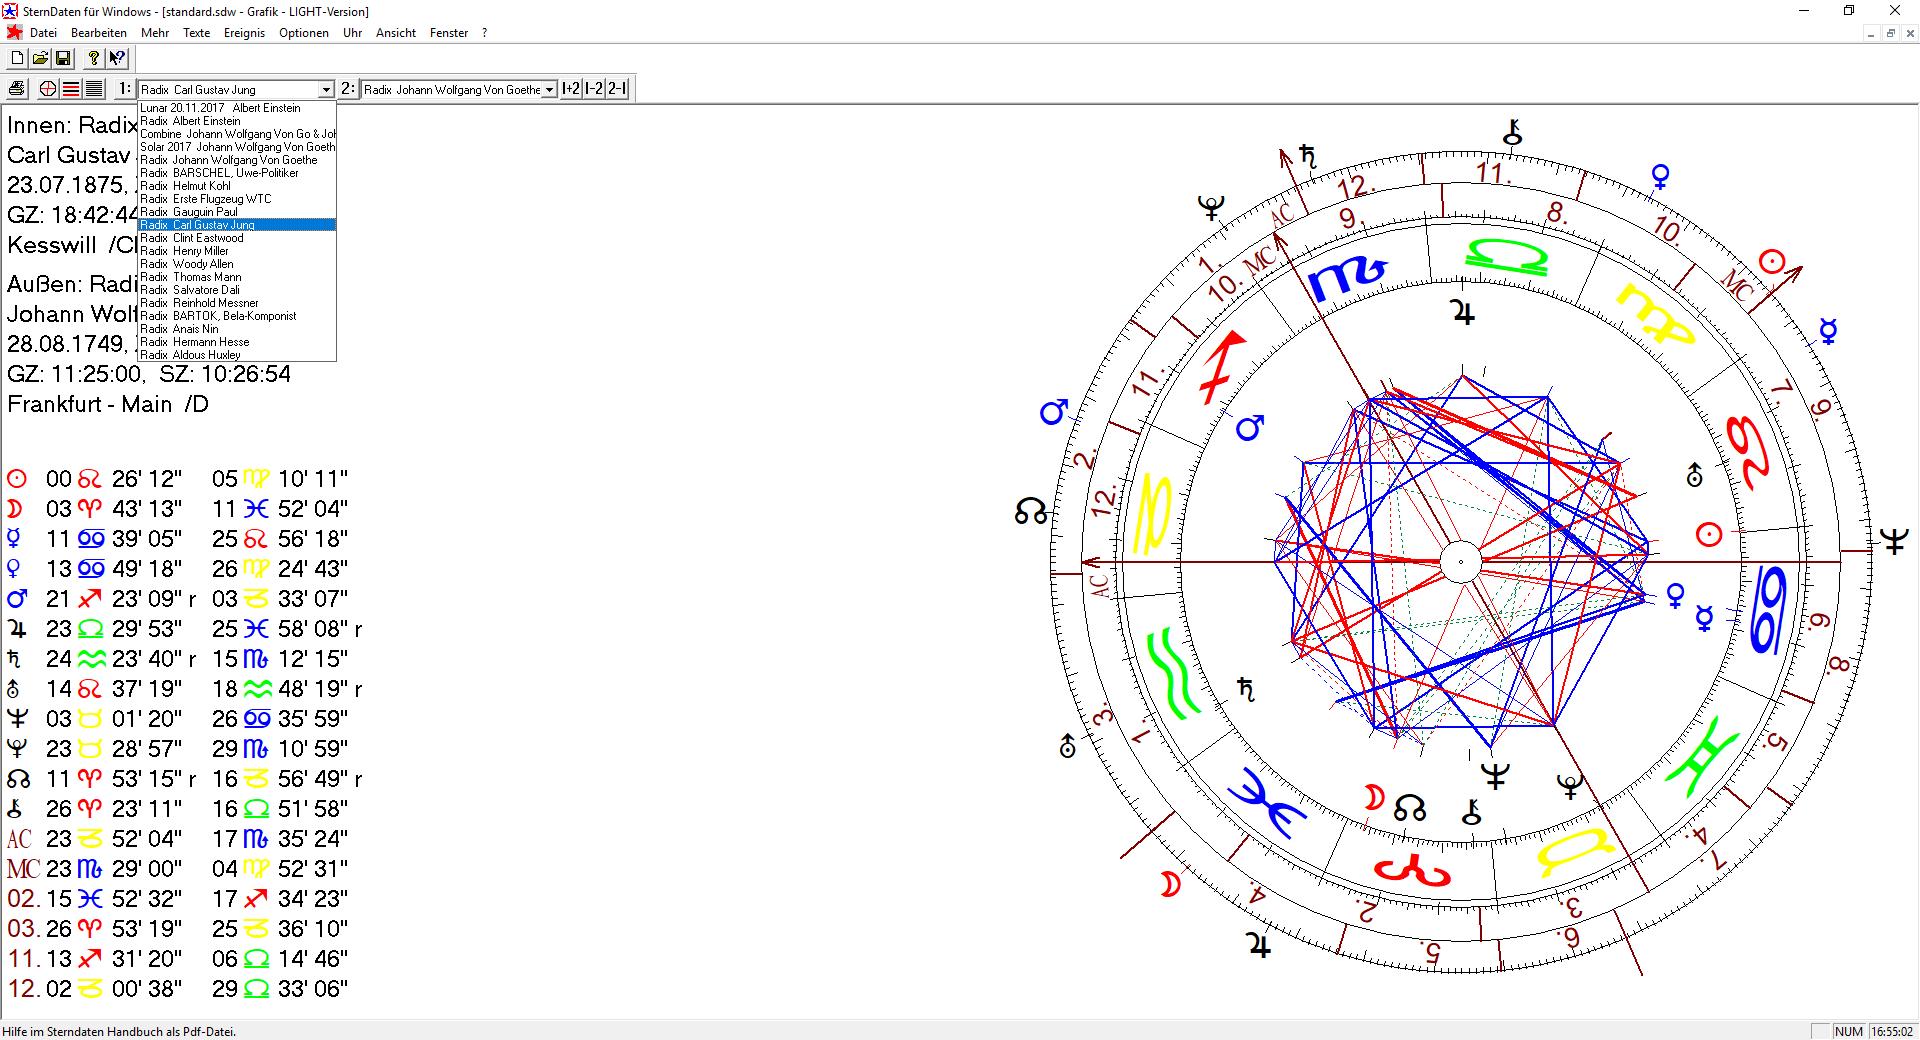 Horoskopliste für Horoskop 1